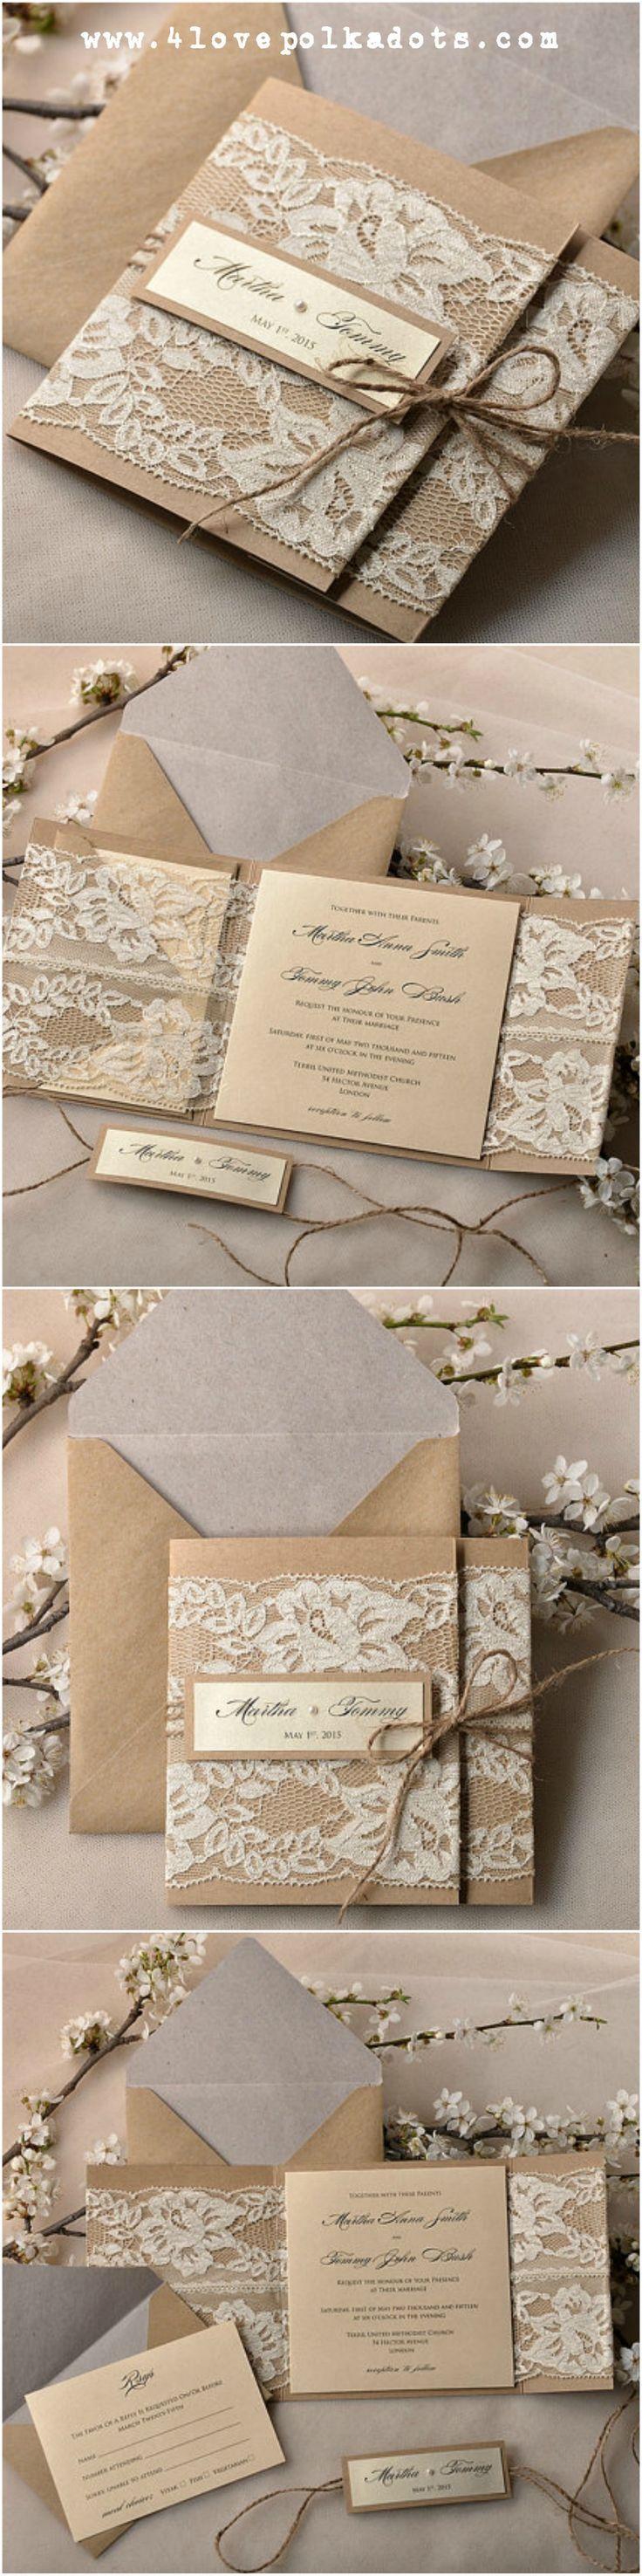 Wedding invitation with lace #4lovepoladots #weddinginvitations #weddingpaper…